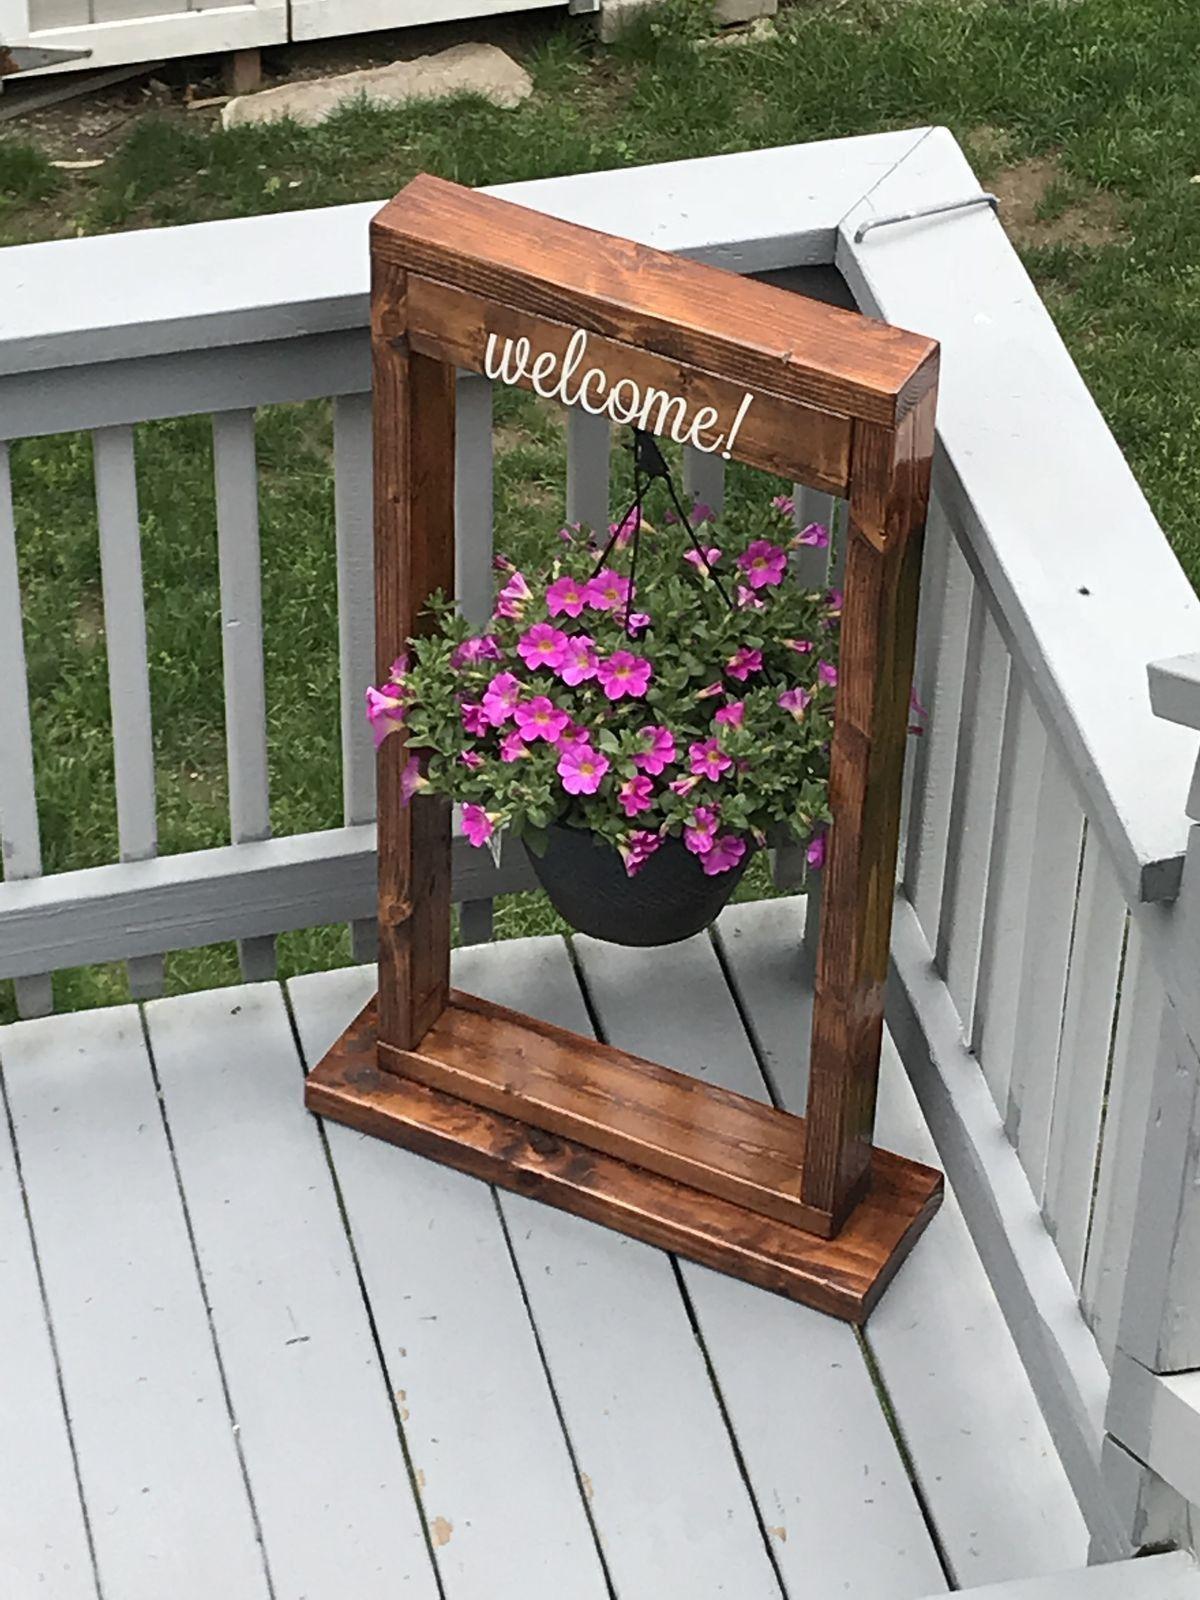 With Mason Jar Fairy Lights Porch Decorating Garden Crafts